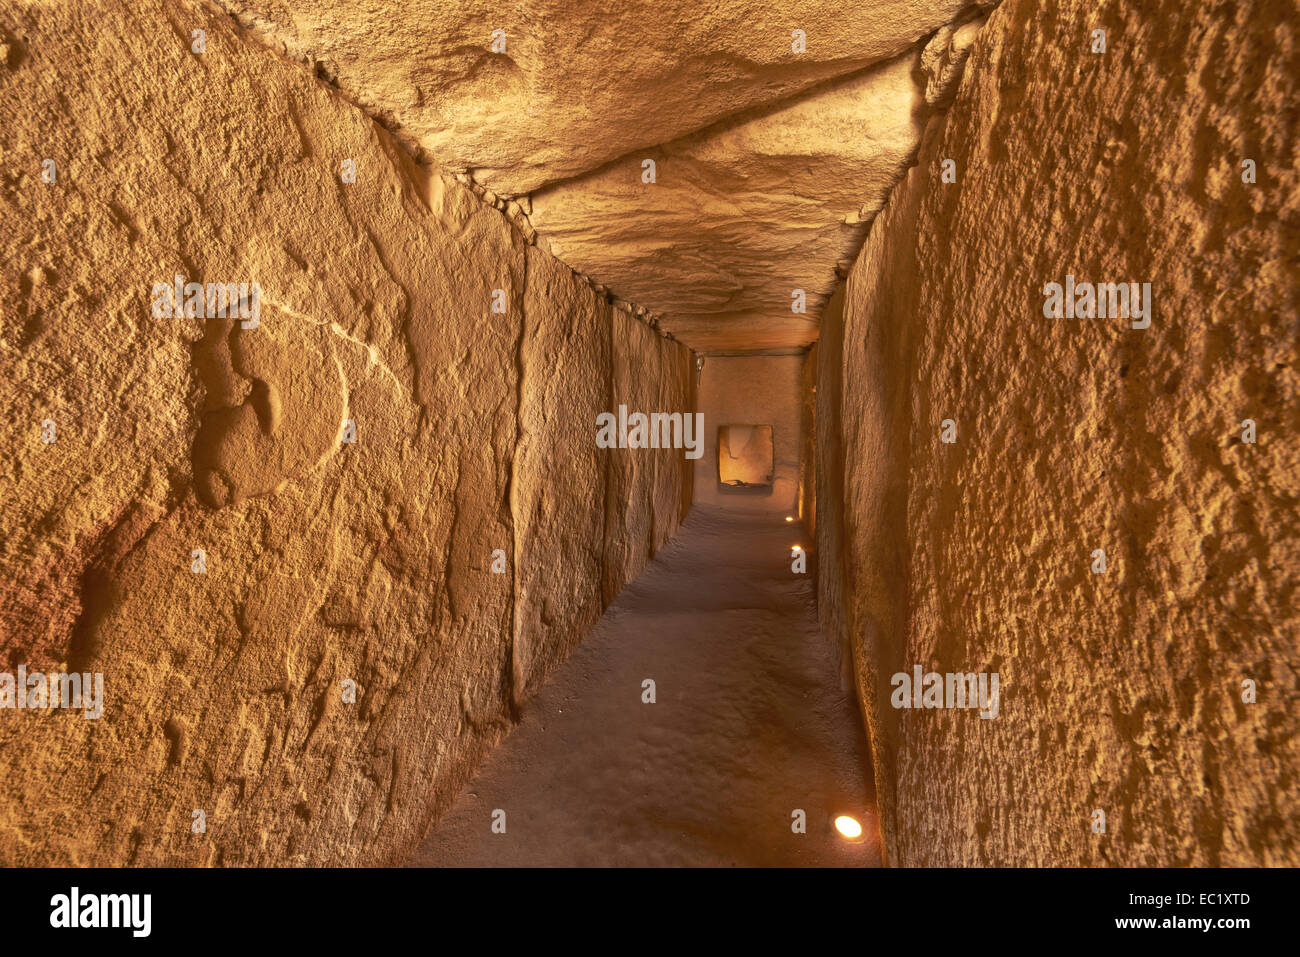 Dolmen of Viera, Viera Megalithic Dolmen, Antequera, Málaga province, Andalusia, Spain, Europe - Stock Image